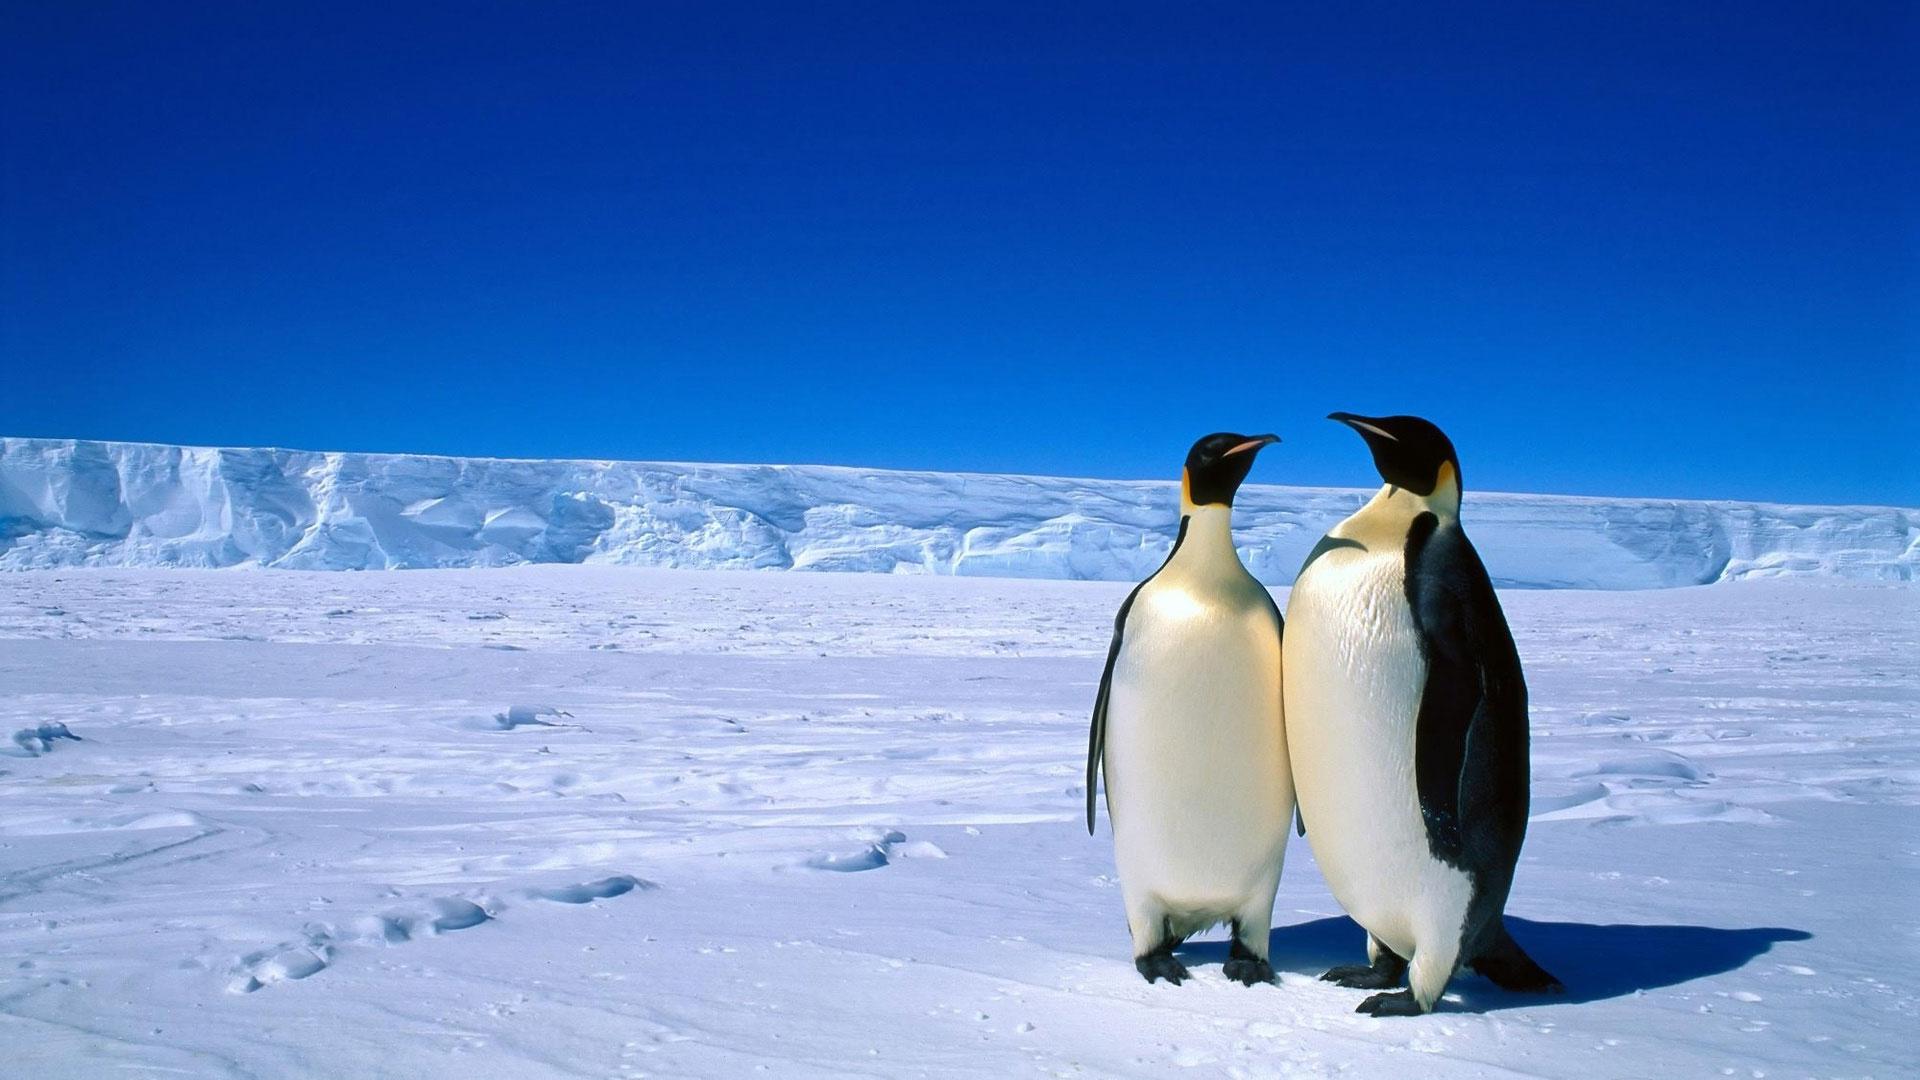 Пингвины на рабочий стол обои и картинки (1)